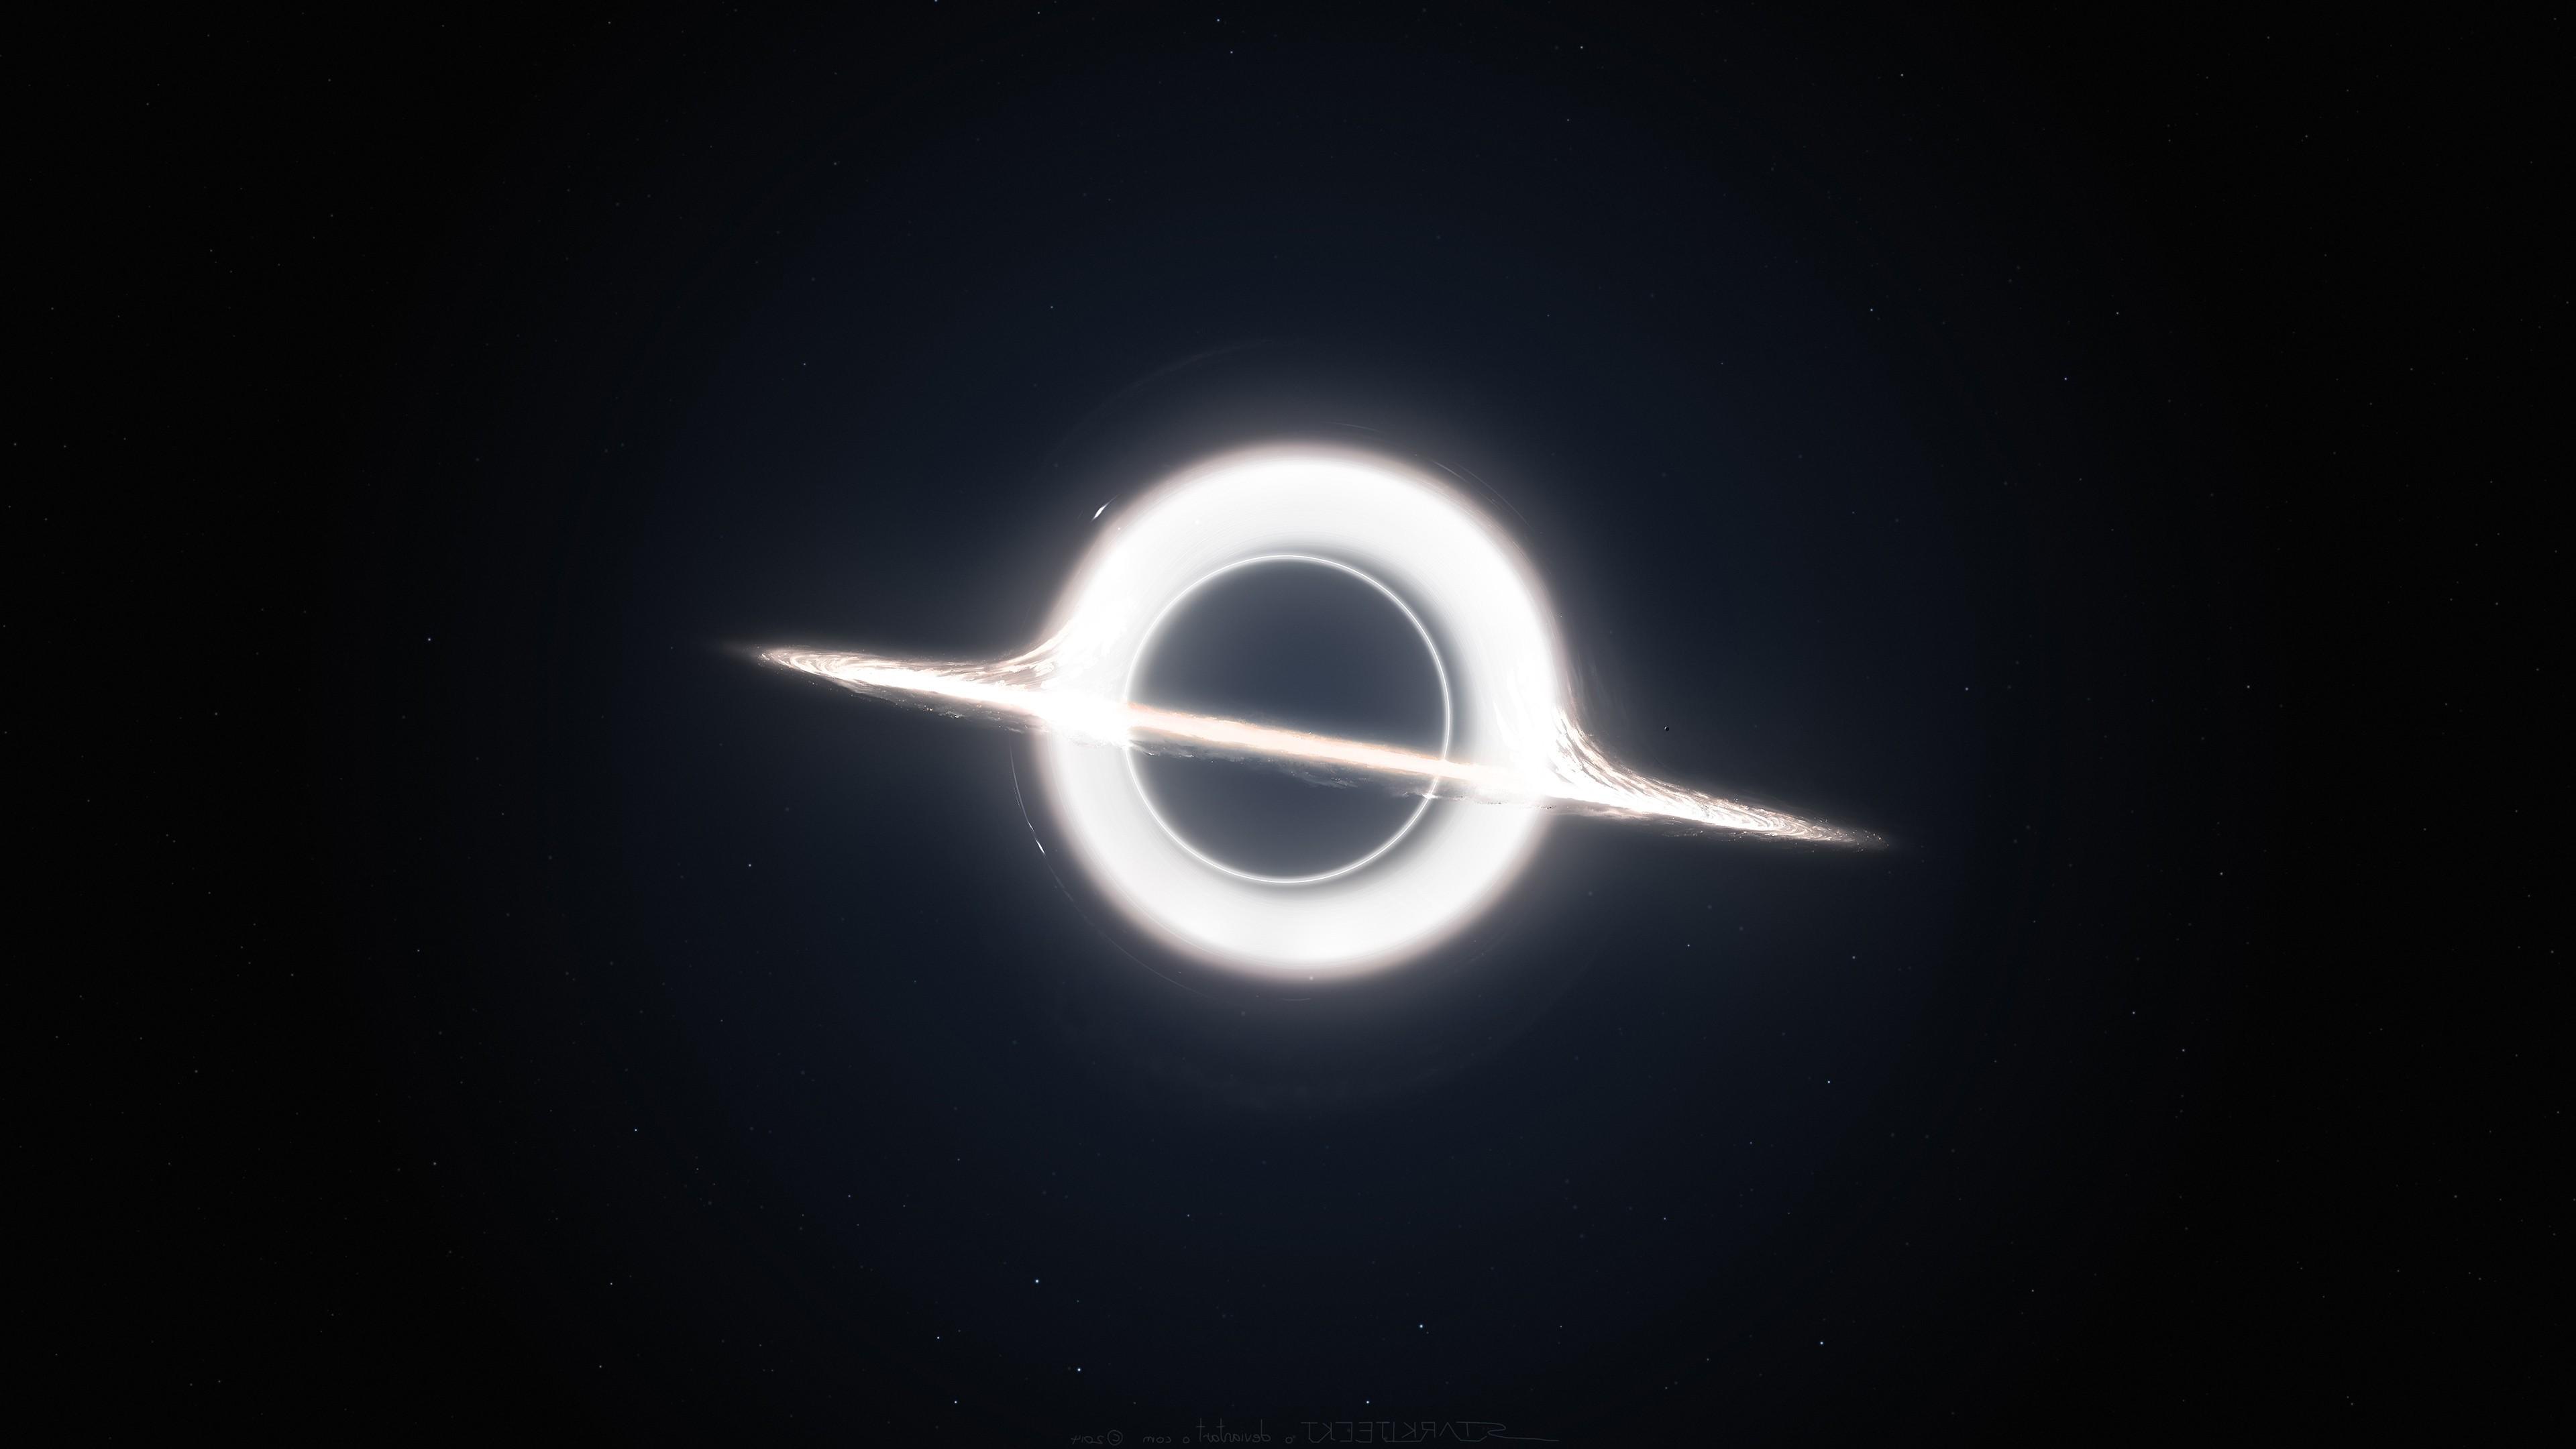 Wallpaper 3840x2160 Px Black Holes Dark Interstellar